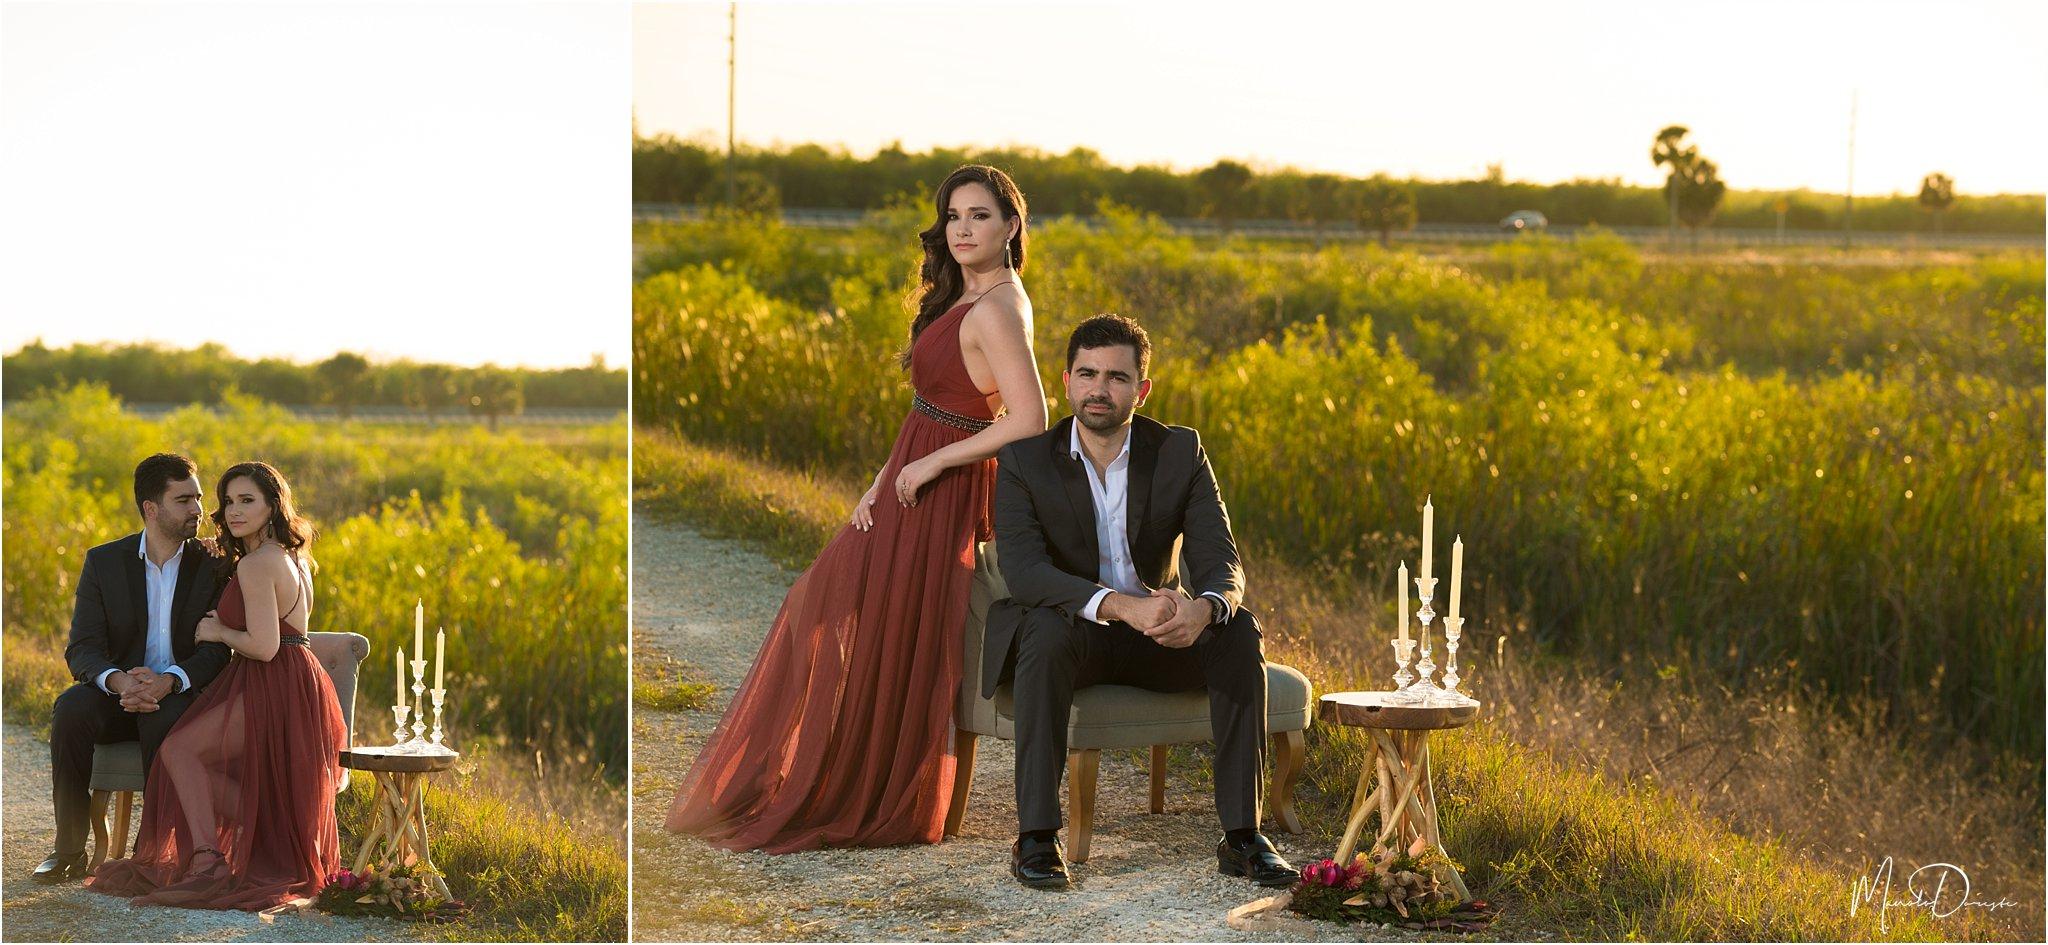 00820_ManoloDoreste_InFocusStudios_Wedding_Family_Photography_Miami_MiamiPhotographer.jpg